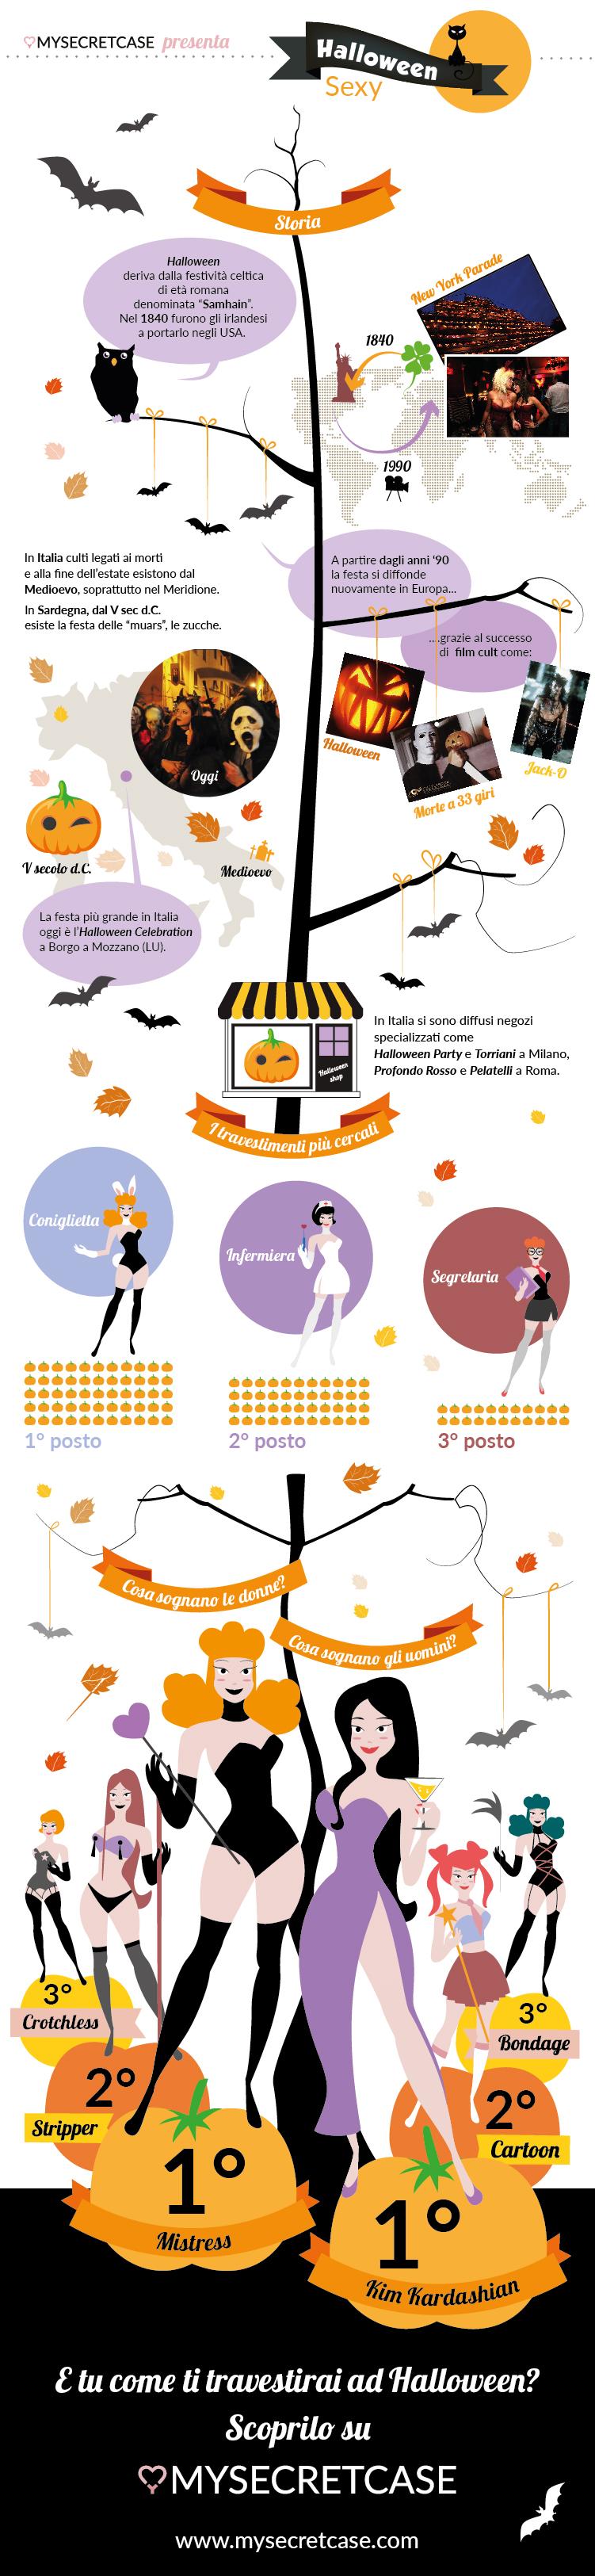 infografica-halloween-mysecretcase